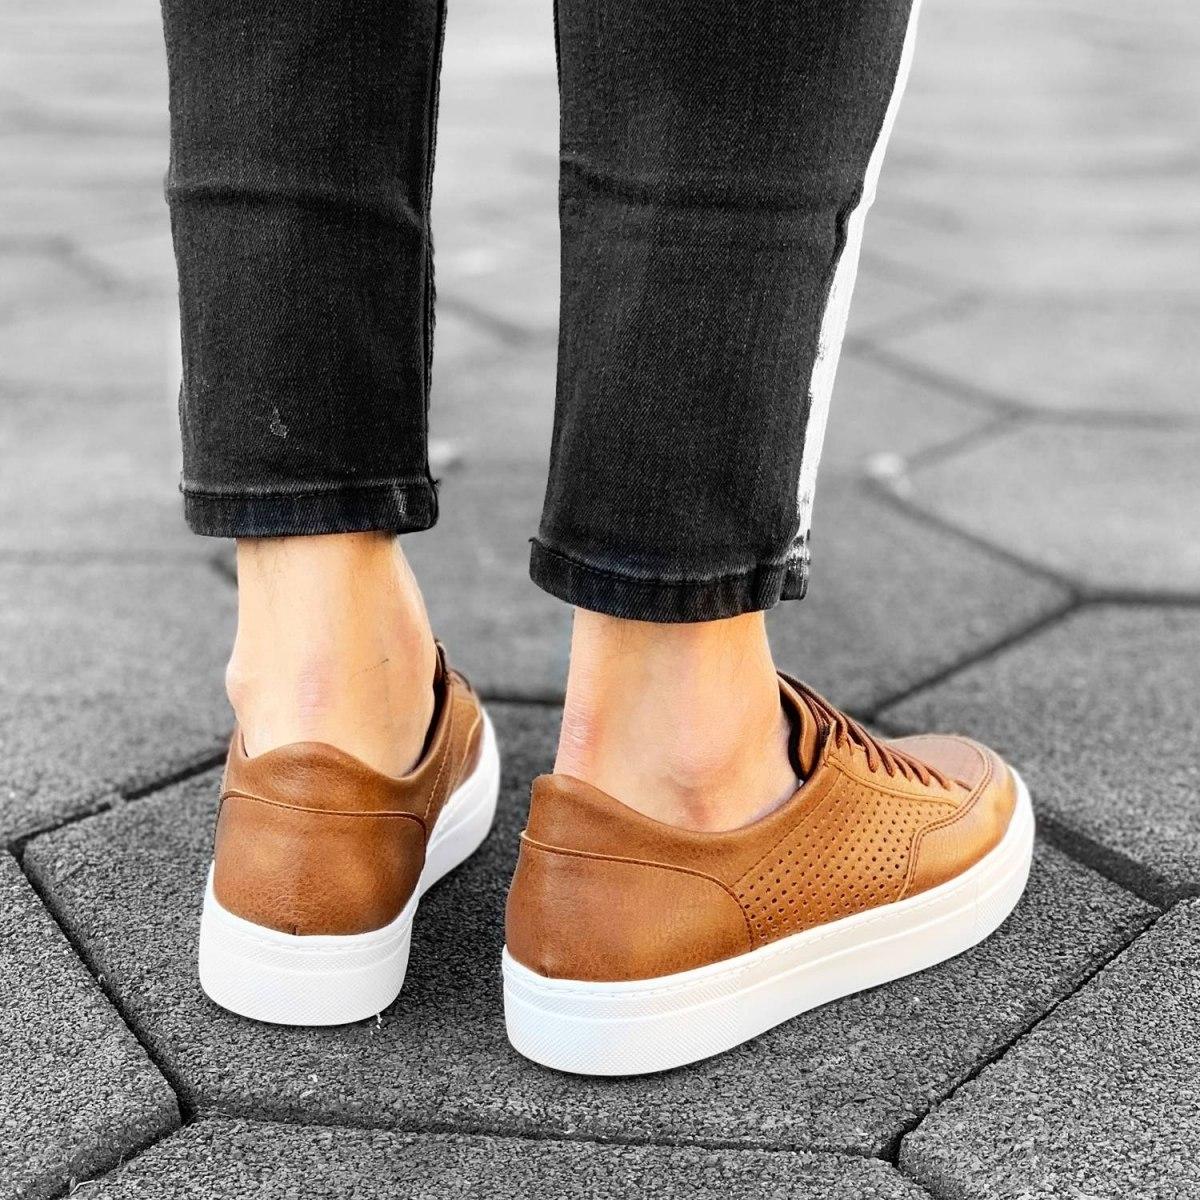 Plexus Sneakers in Tan-White